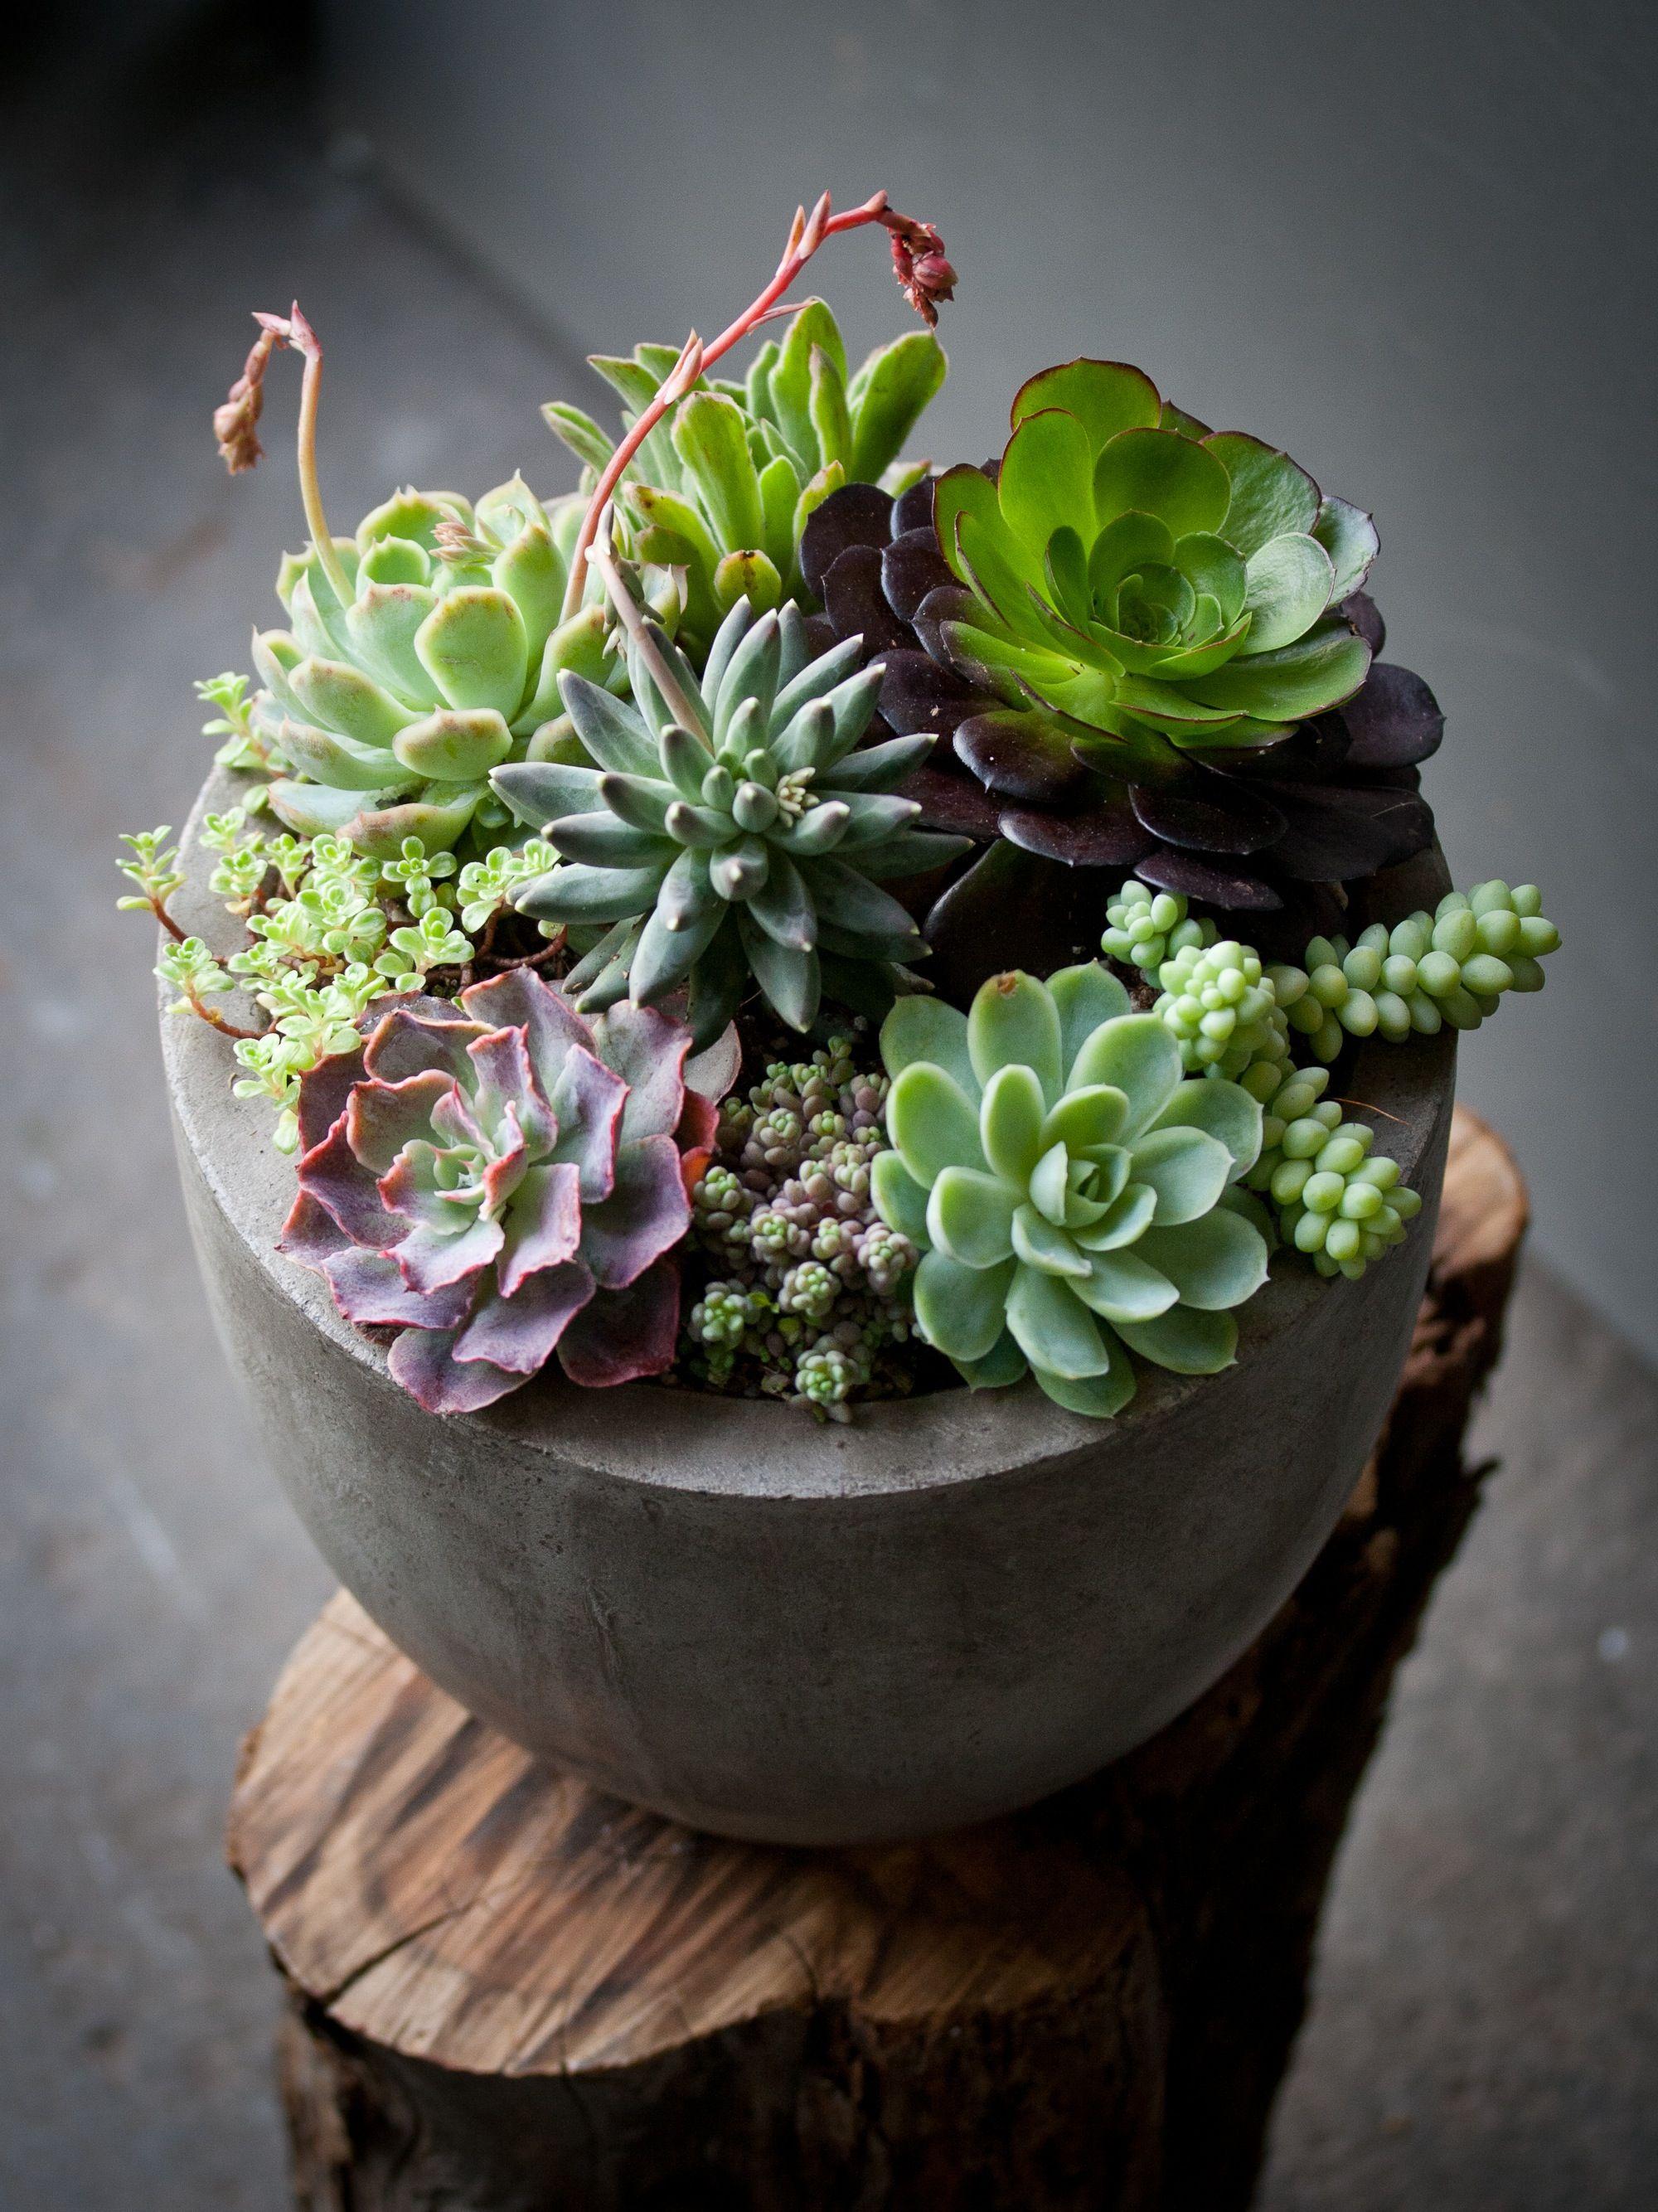 14 best plants. images on Pinterest | Plants, Gardening and Indoor plants